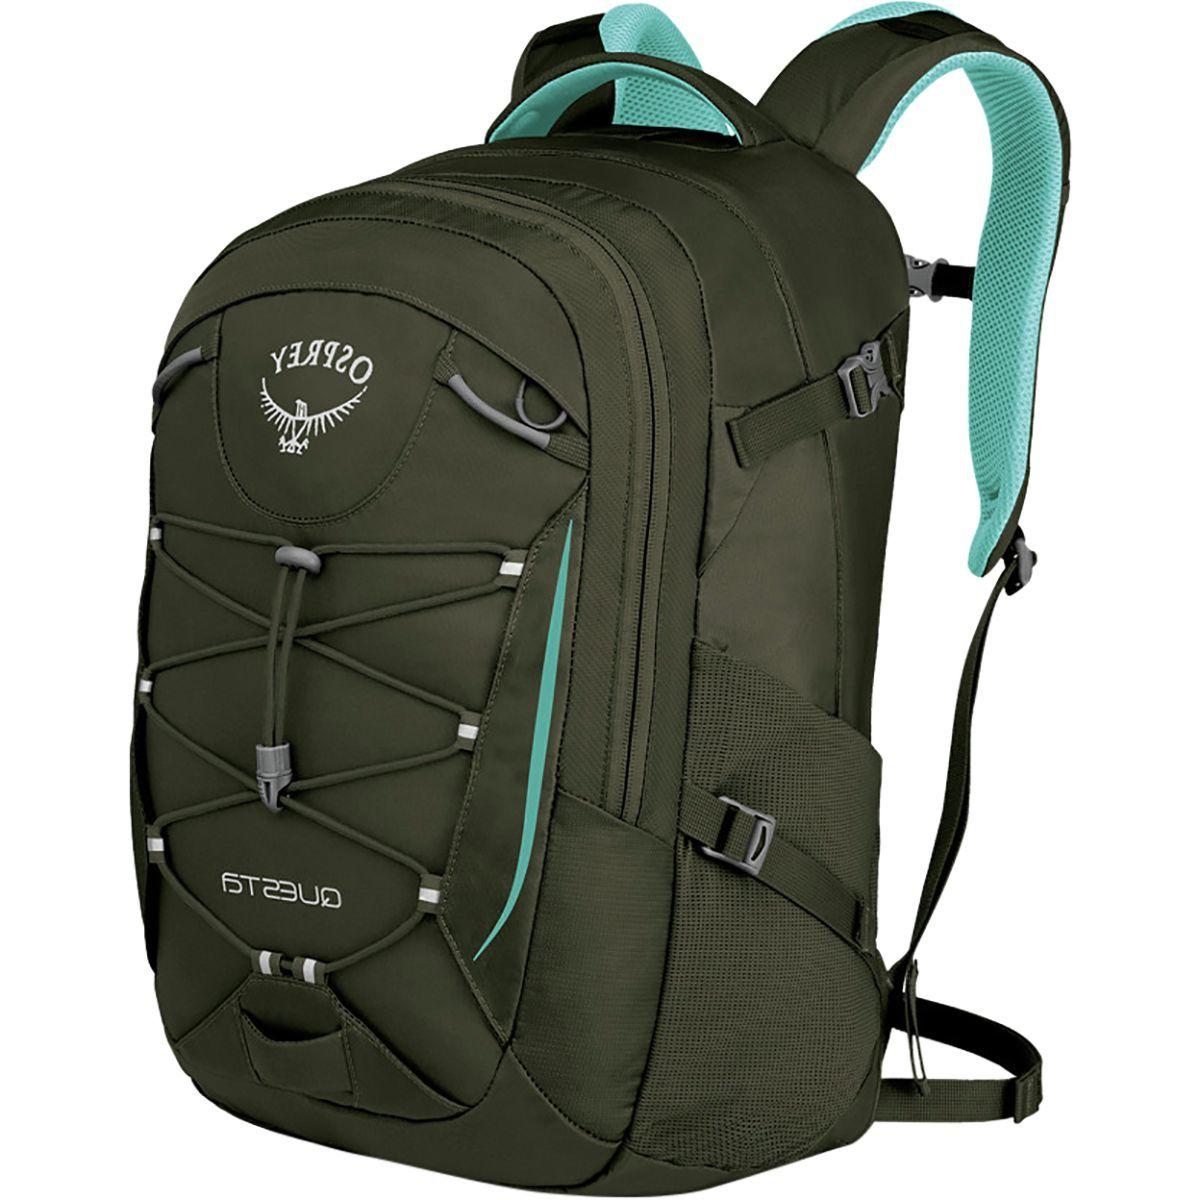 Osprey Packs Questa 27L Backpack - Women's